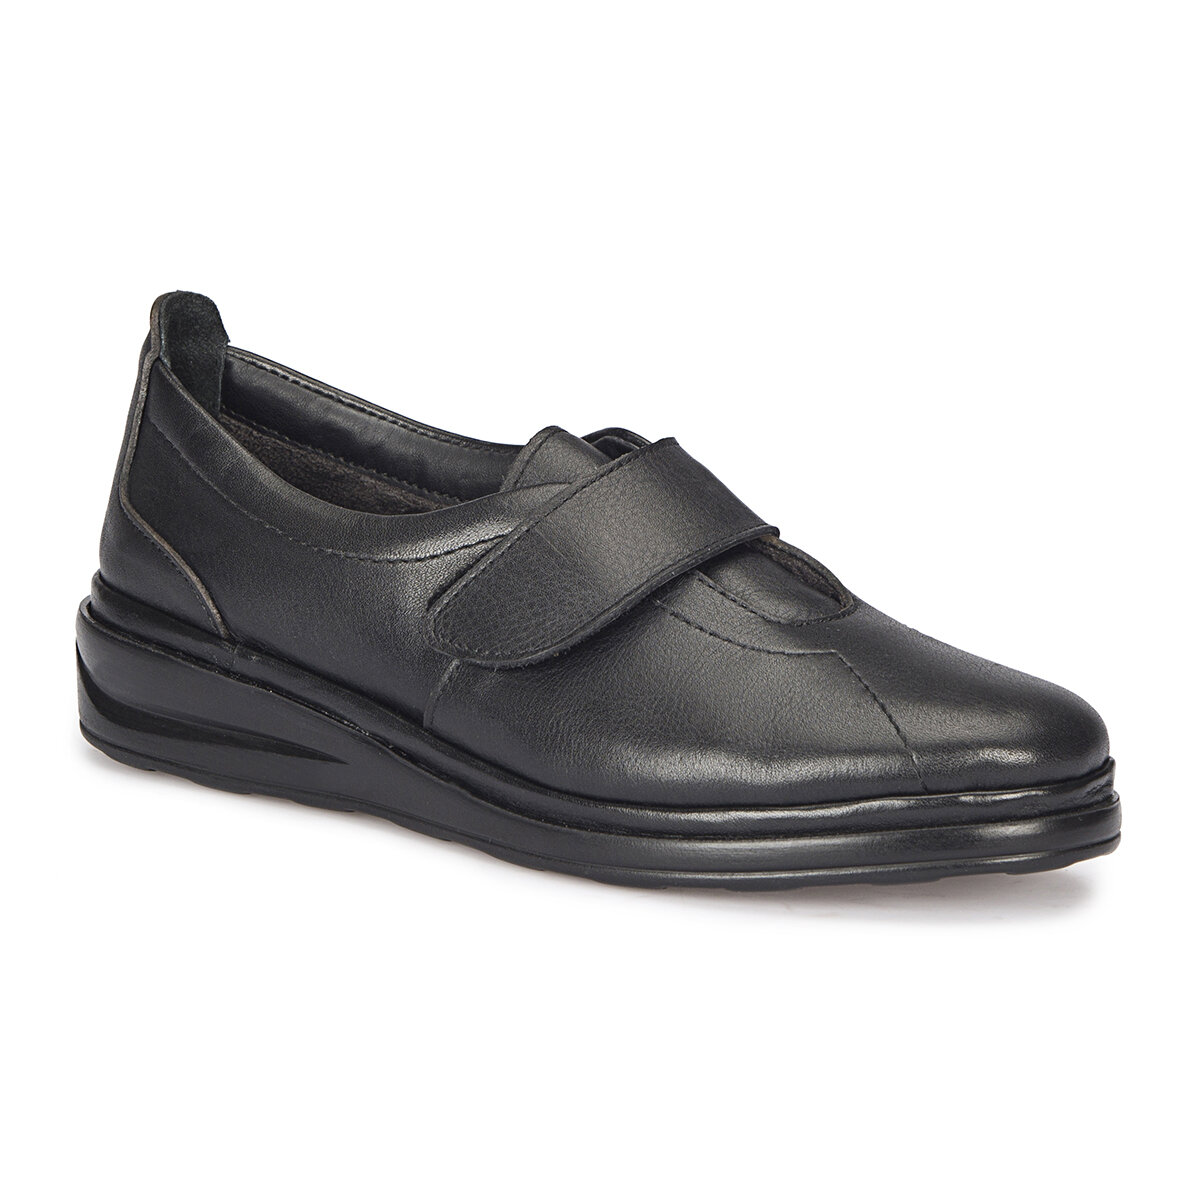 FLO 72. 110020.Z Black Women Shoes Polaris 5 Point